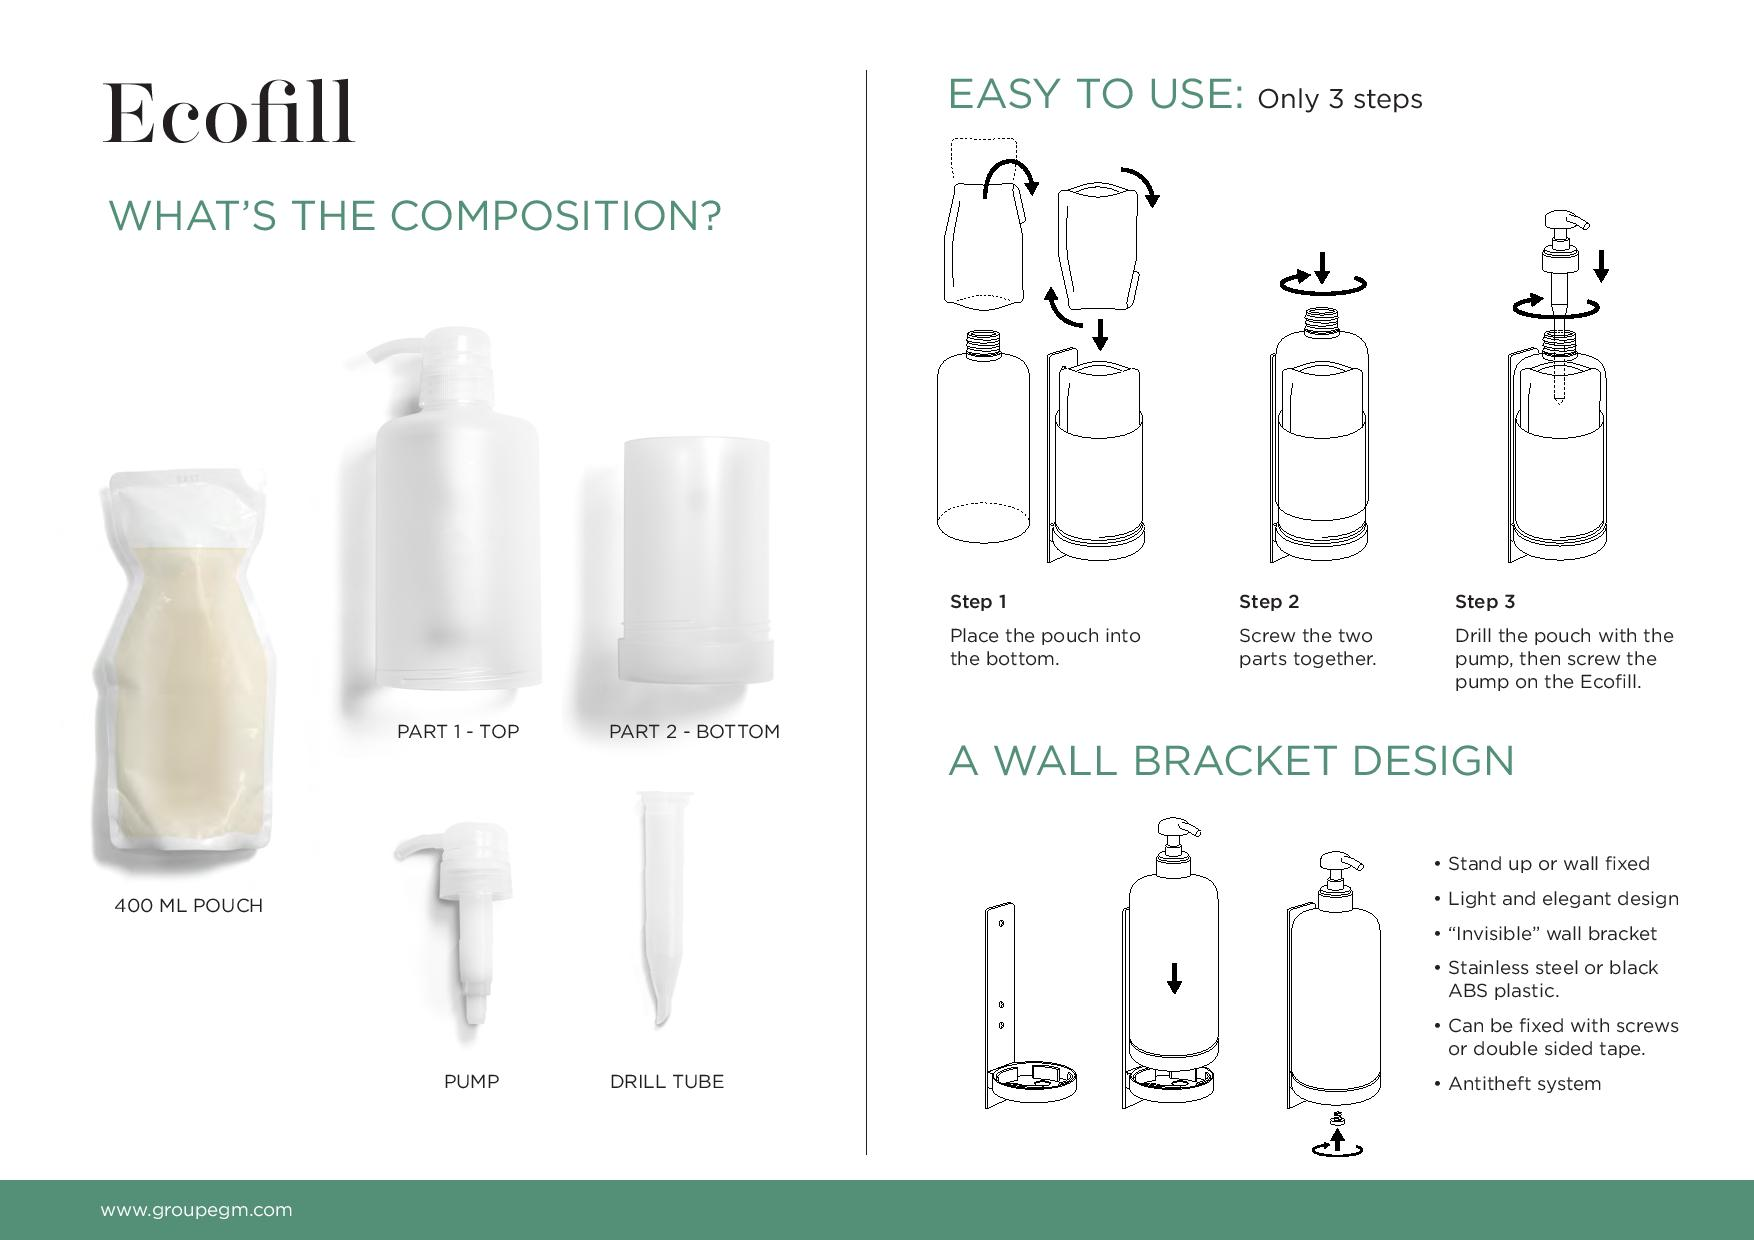 Ecofill instrukcja obsługi